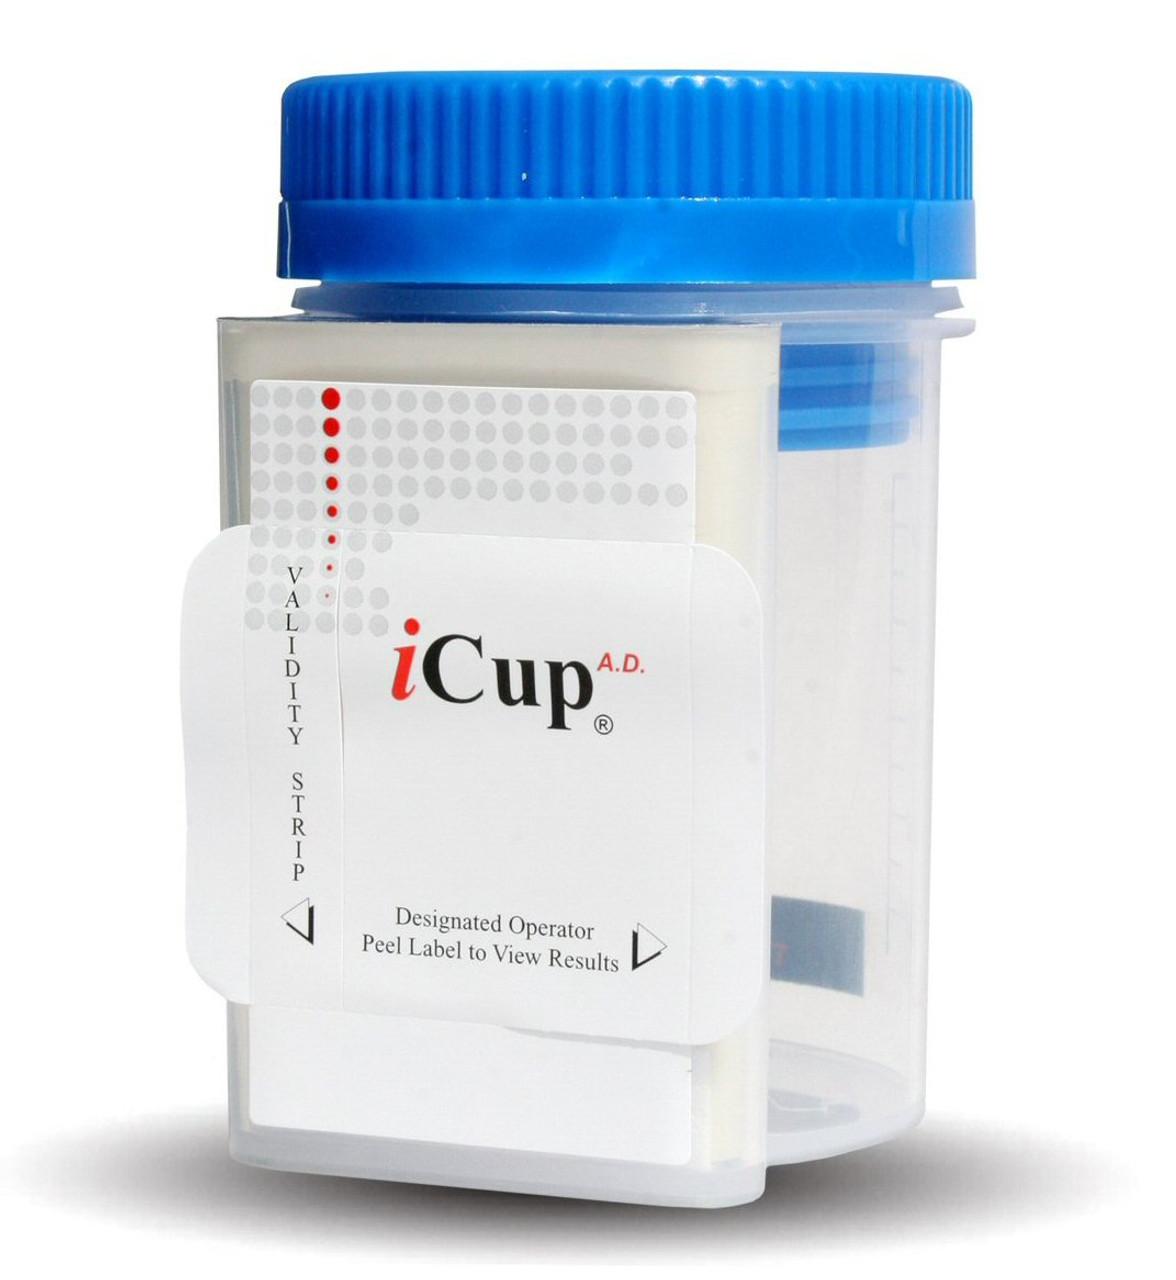 iCup 7 Panel Abbott / Alere Diagnostics Drug Test Cup